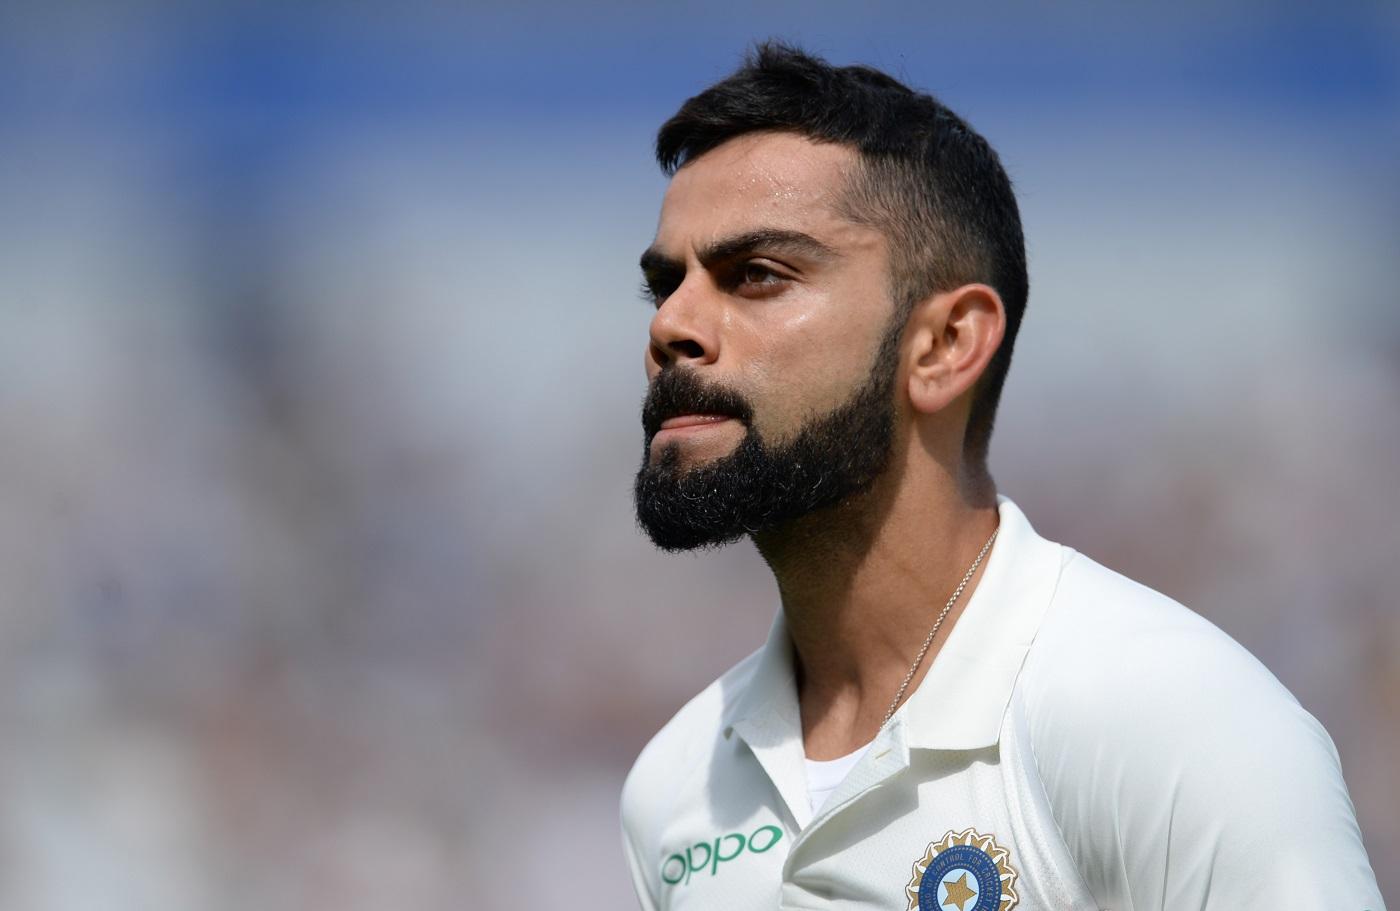 England vs India, Virat Kohli